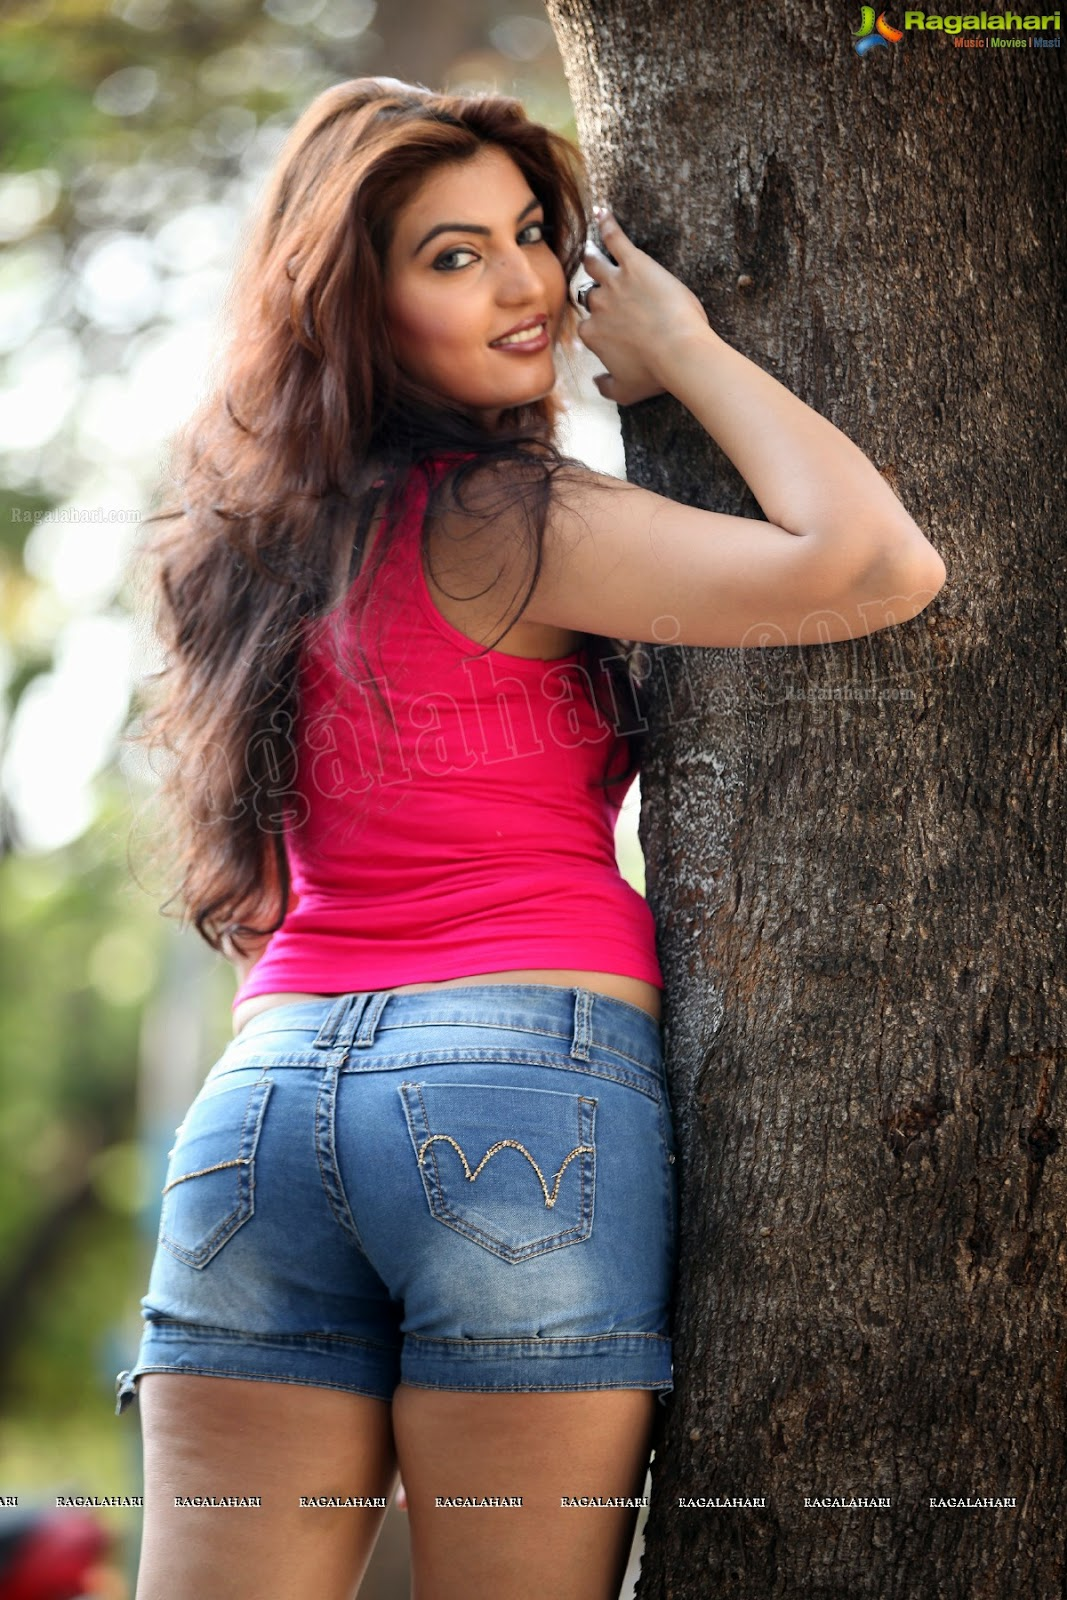 hd Search  BadwapDesi 3gp mp4 hd sex video indian sex